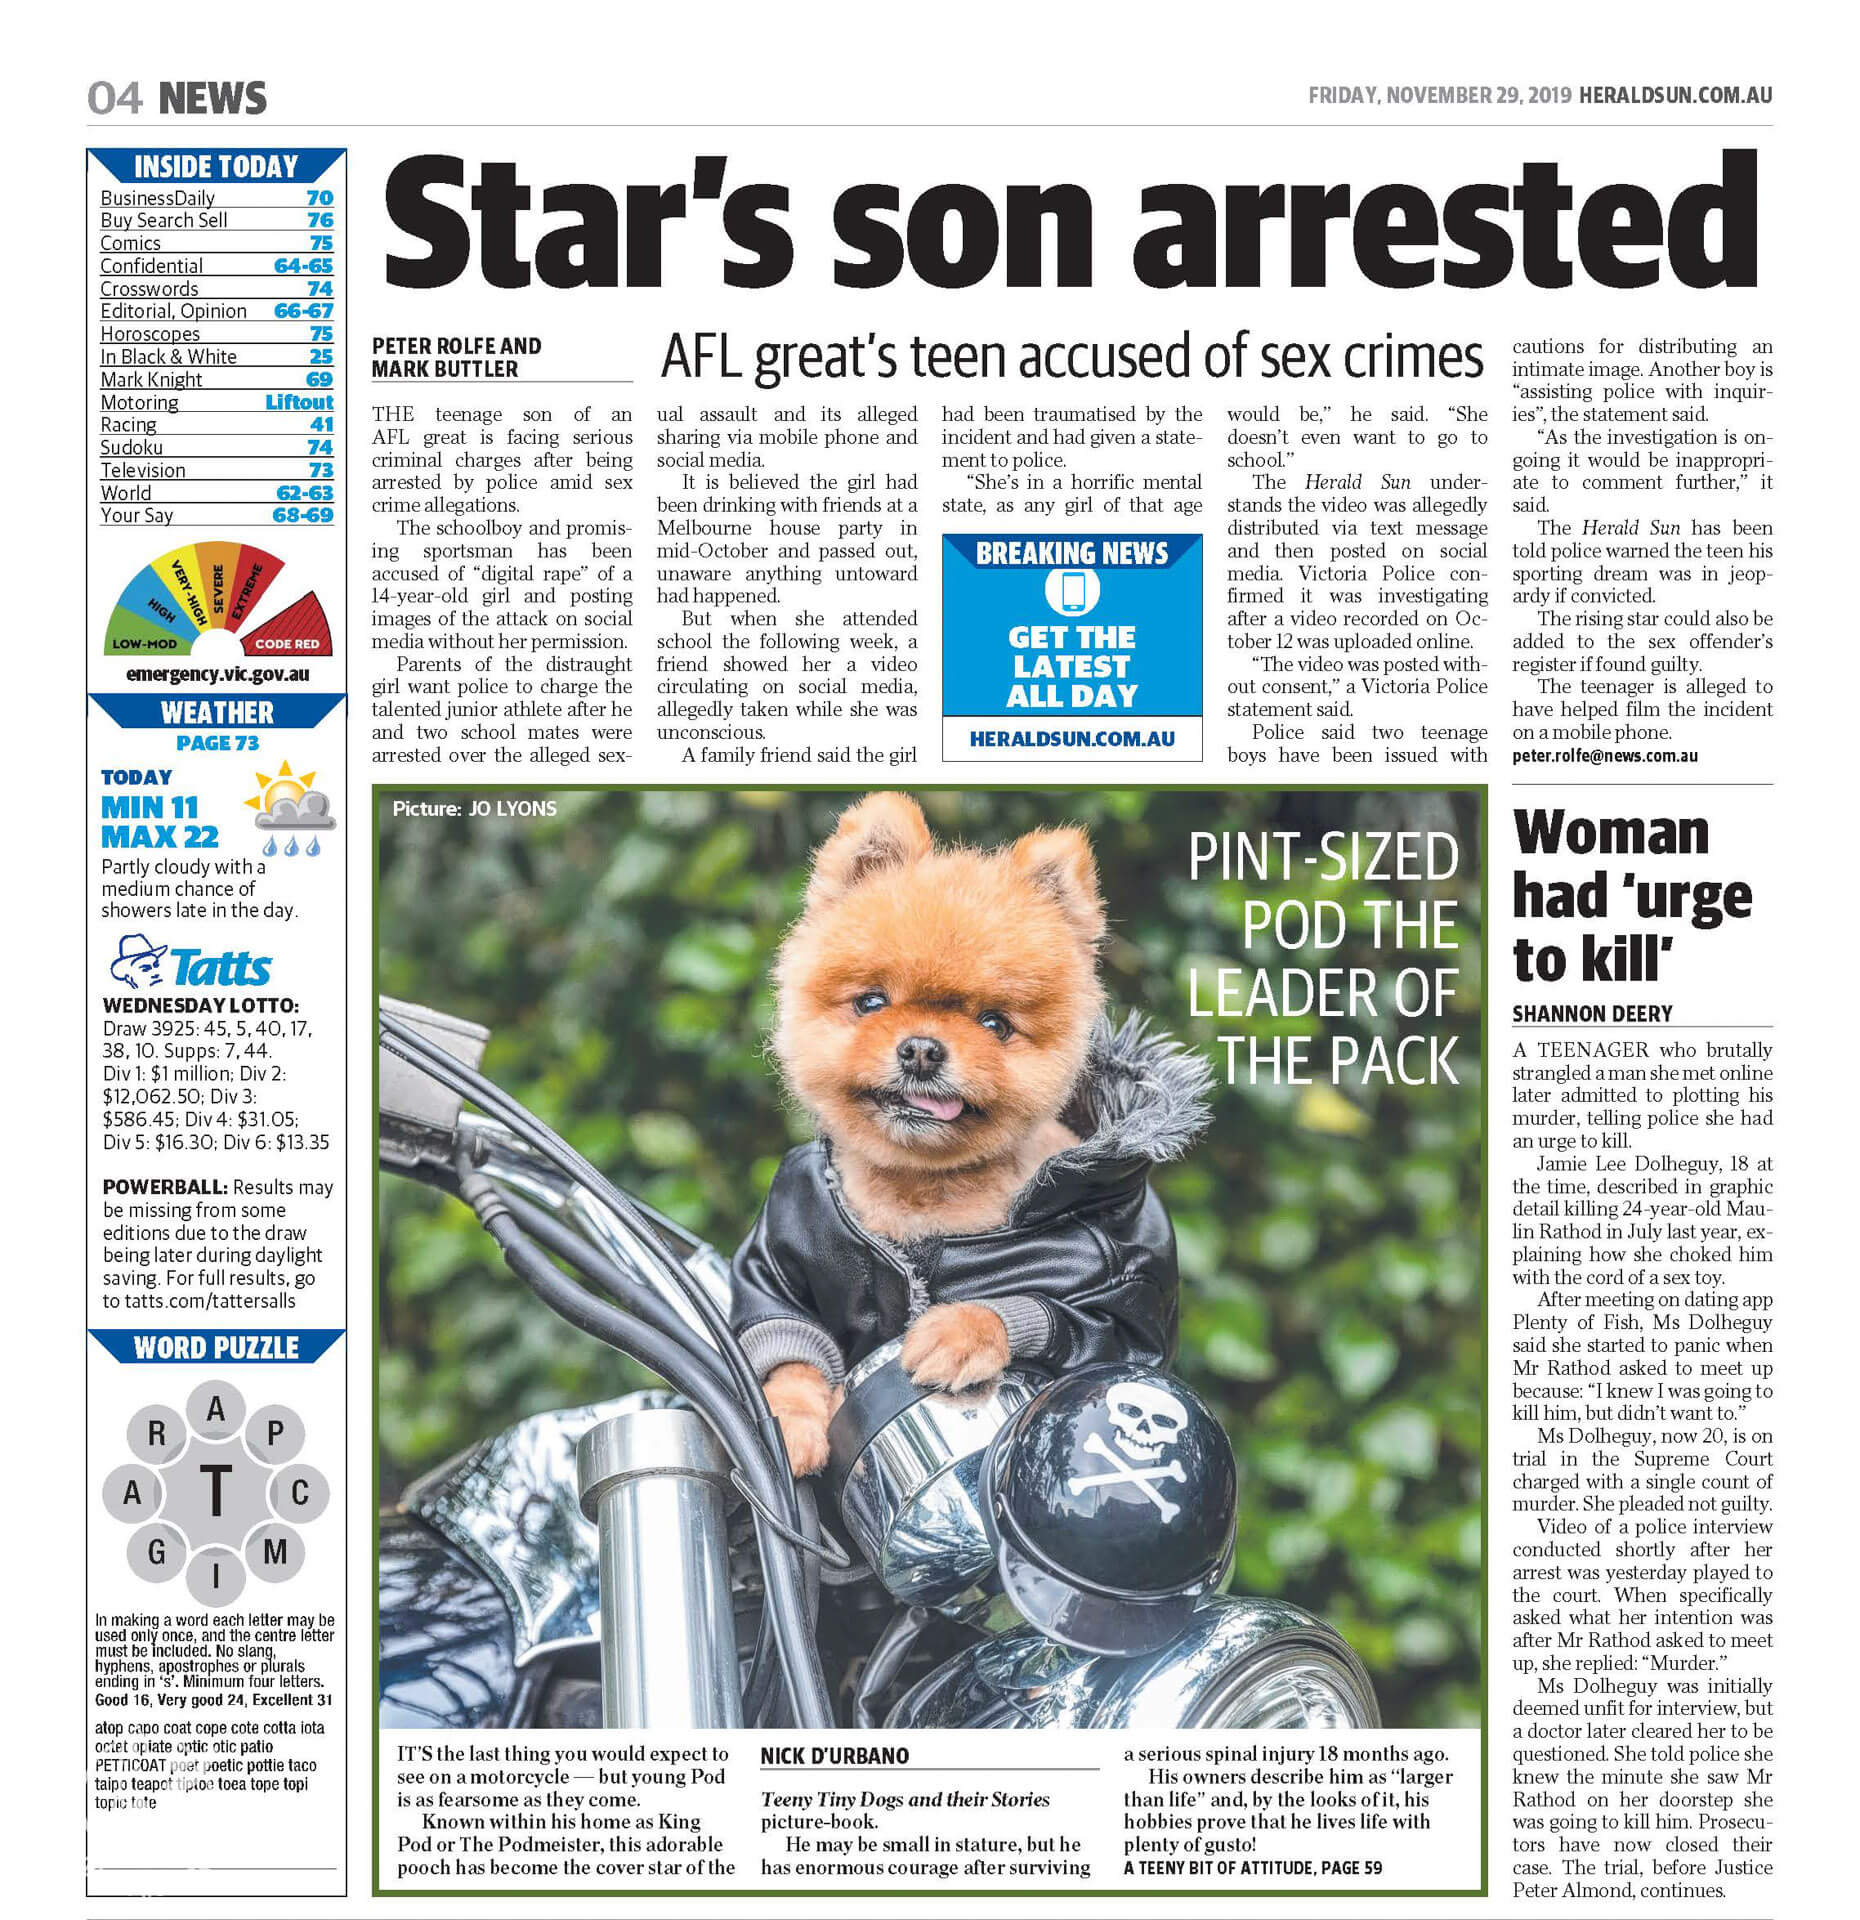 Pod the orange Pomeranian dog posing on his motorbike. Chrome. Black, Green. Helmet. Skull and Crossbones.